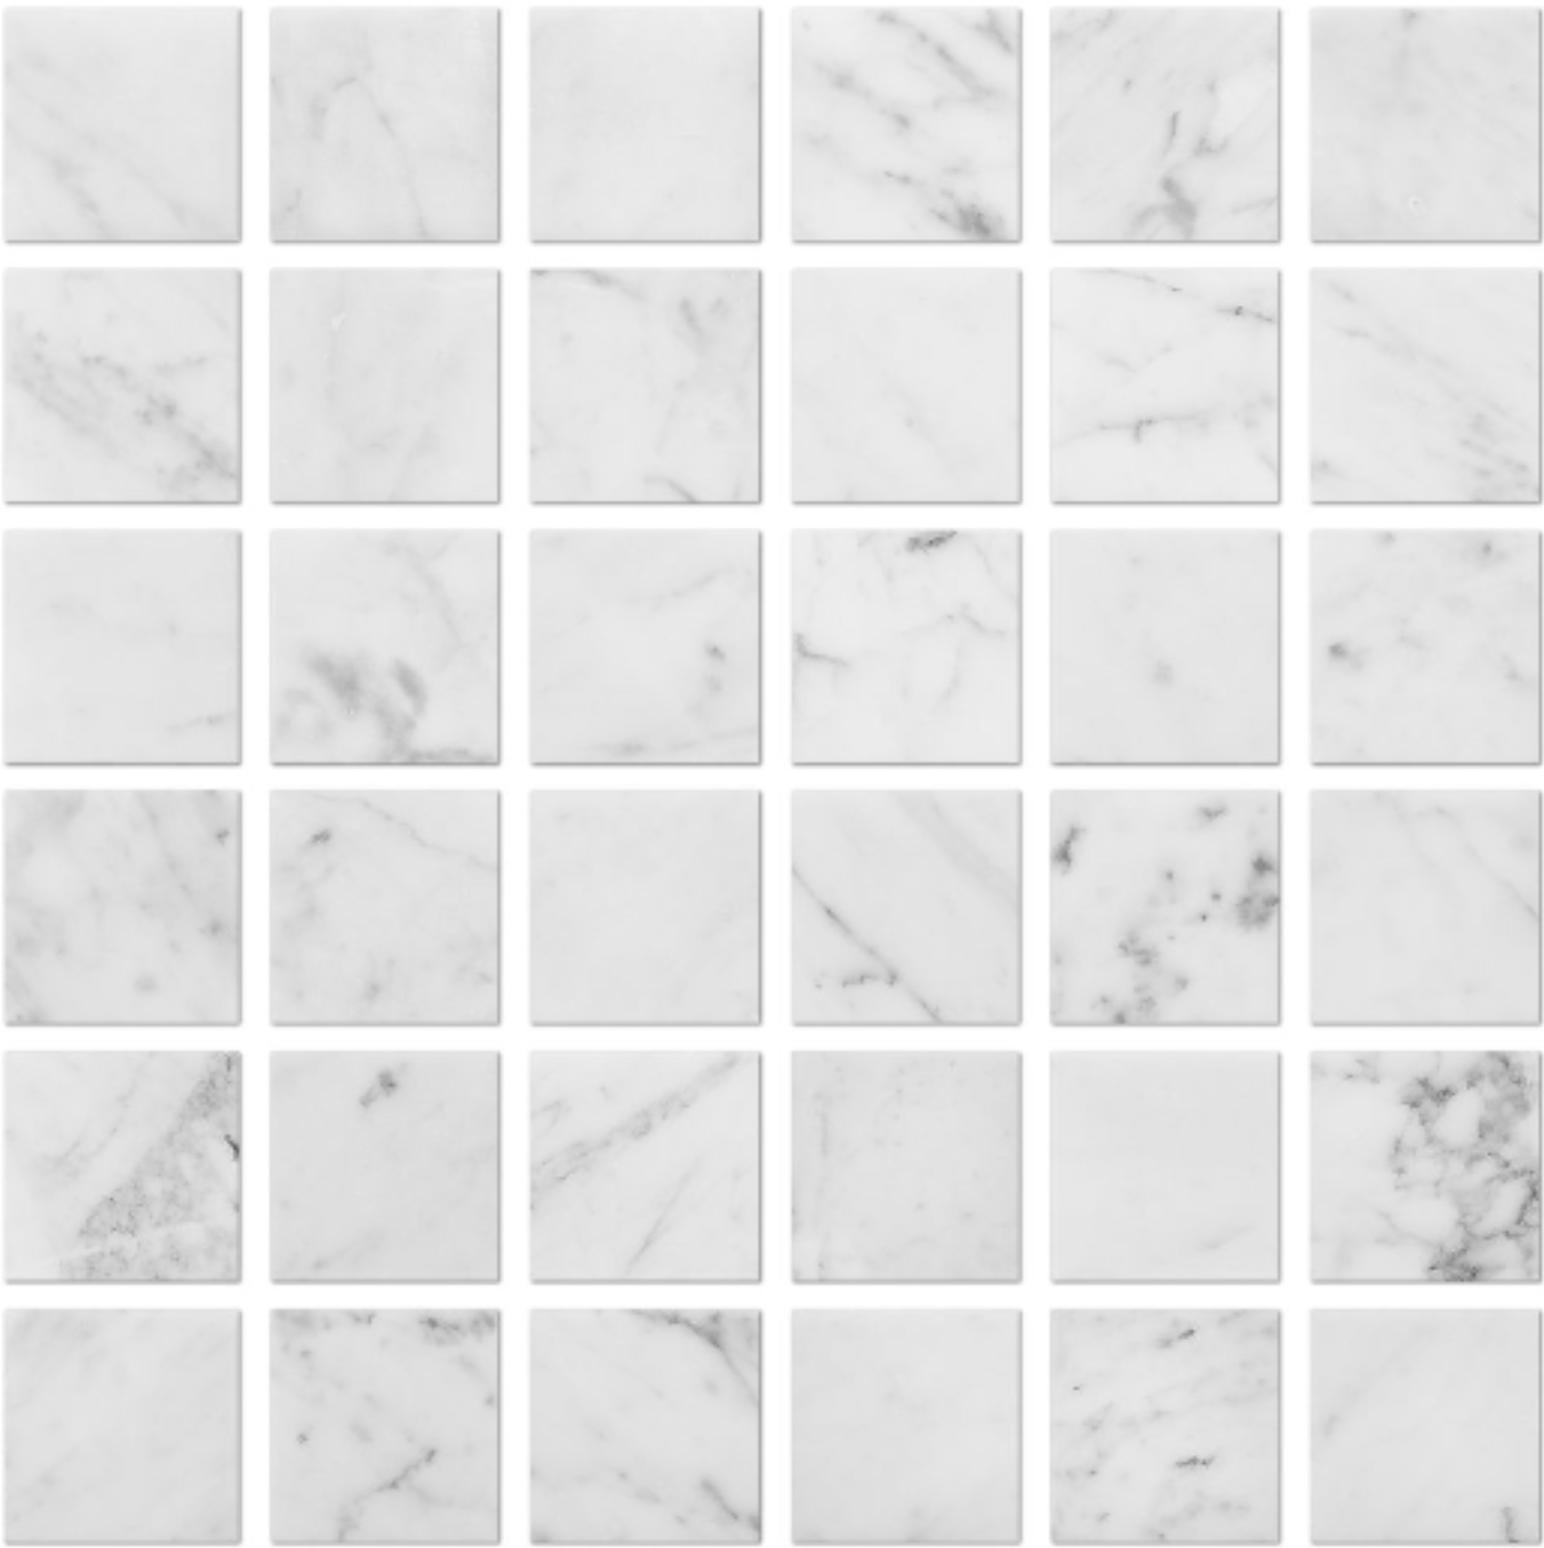 Italia F Carrara White Marble Polished Mosaic - 2 x 2 in.